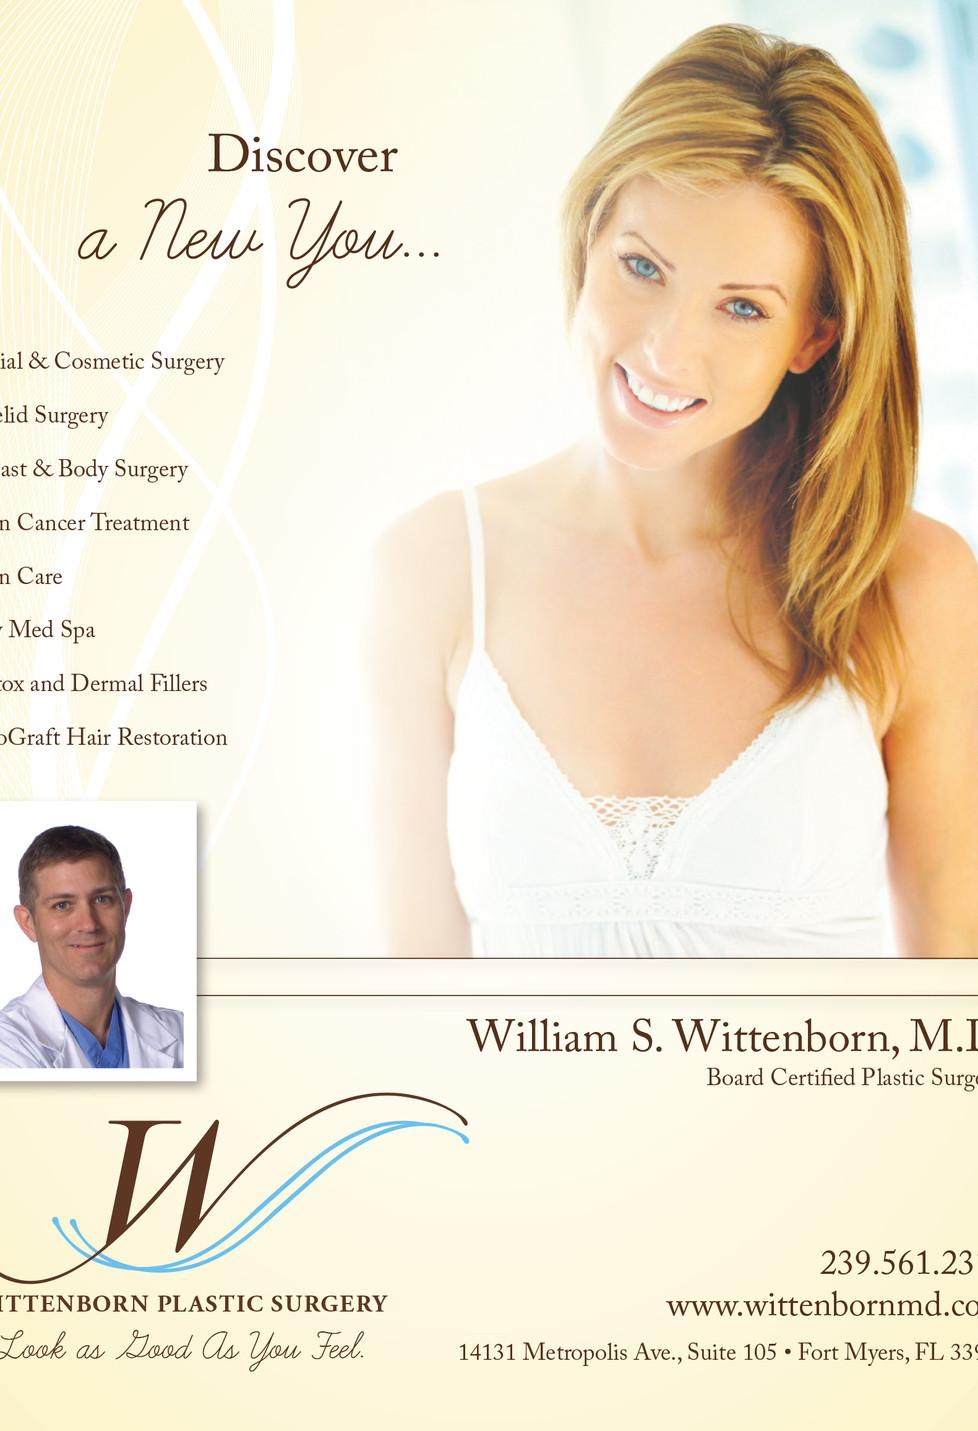 wittenborn ad.jpg